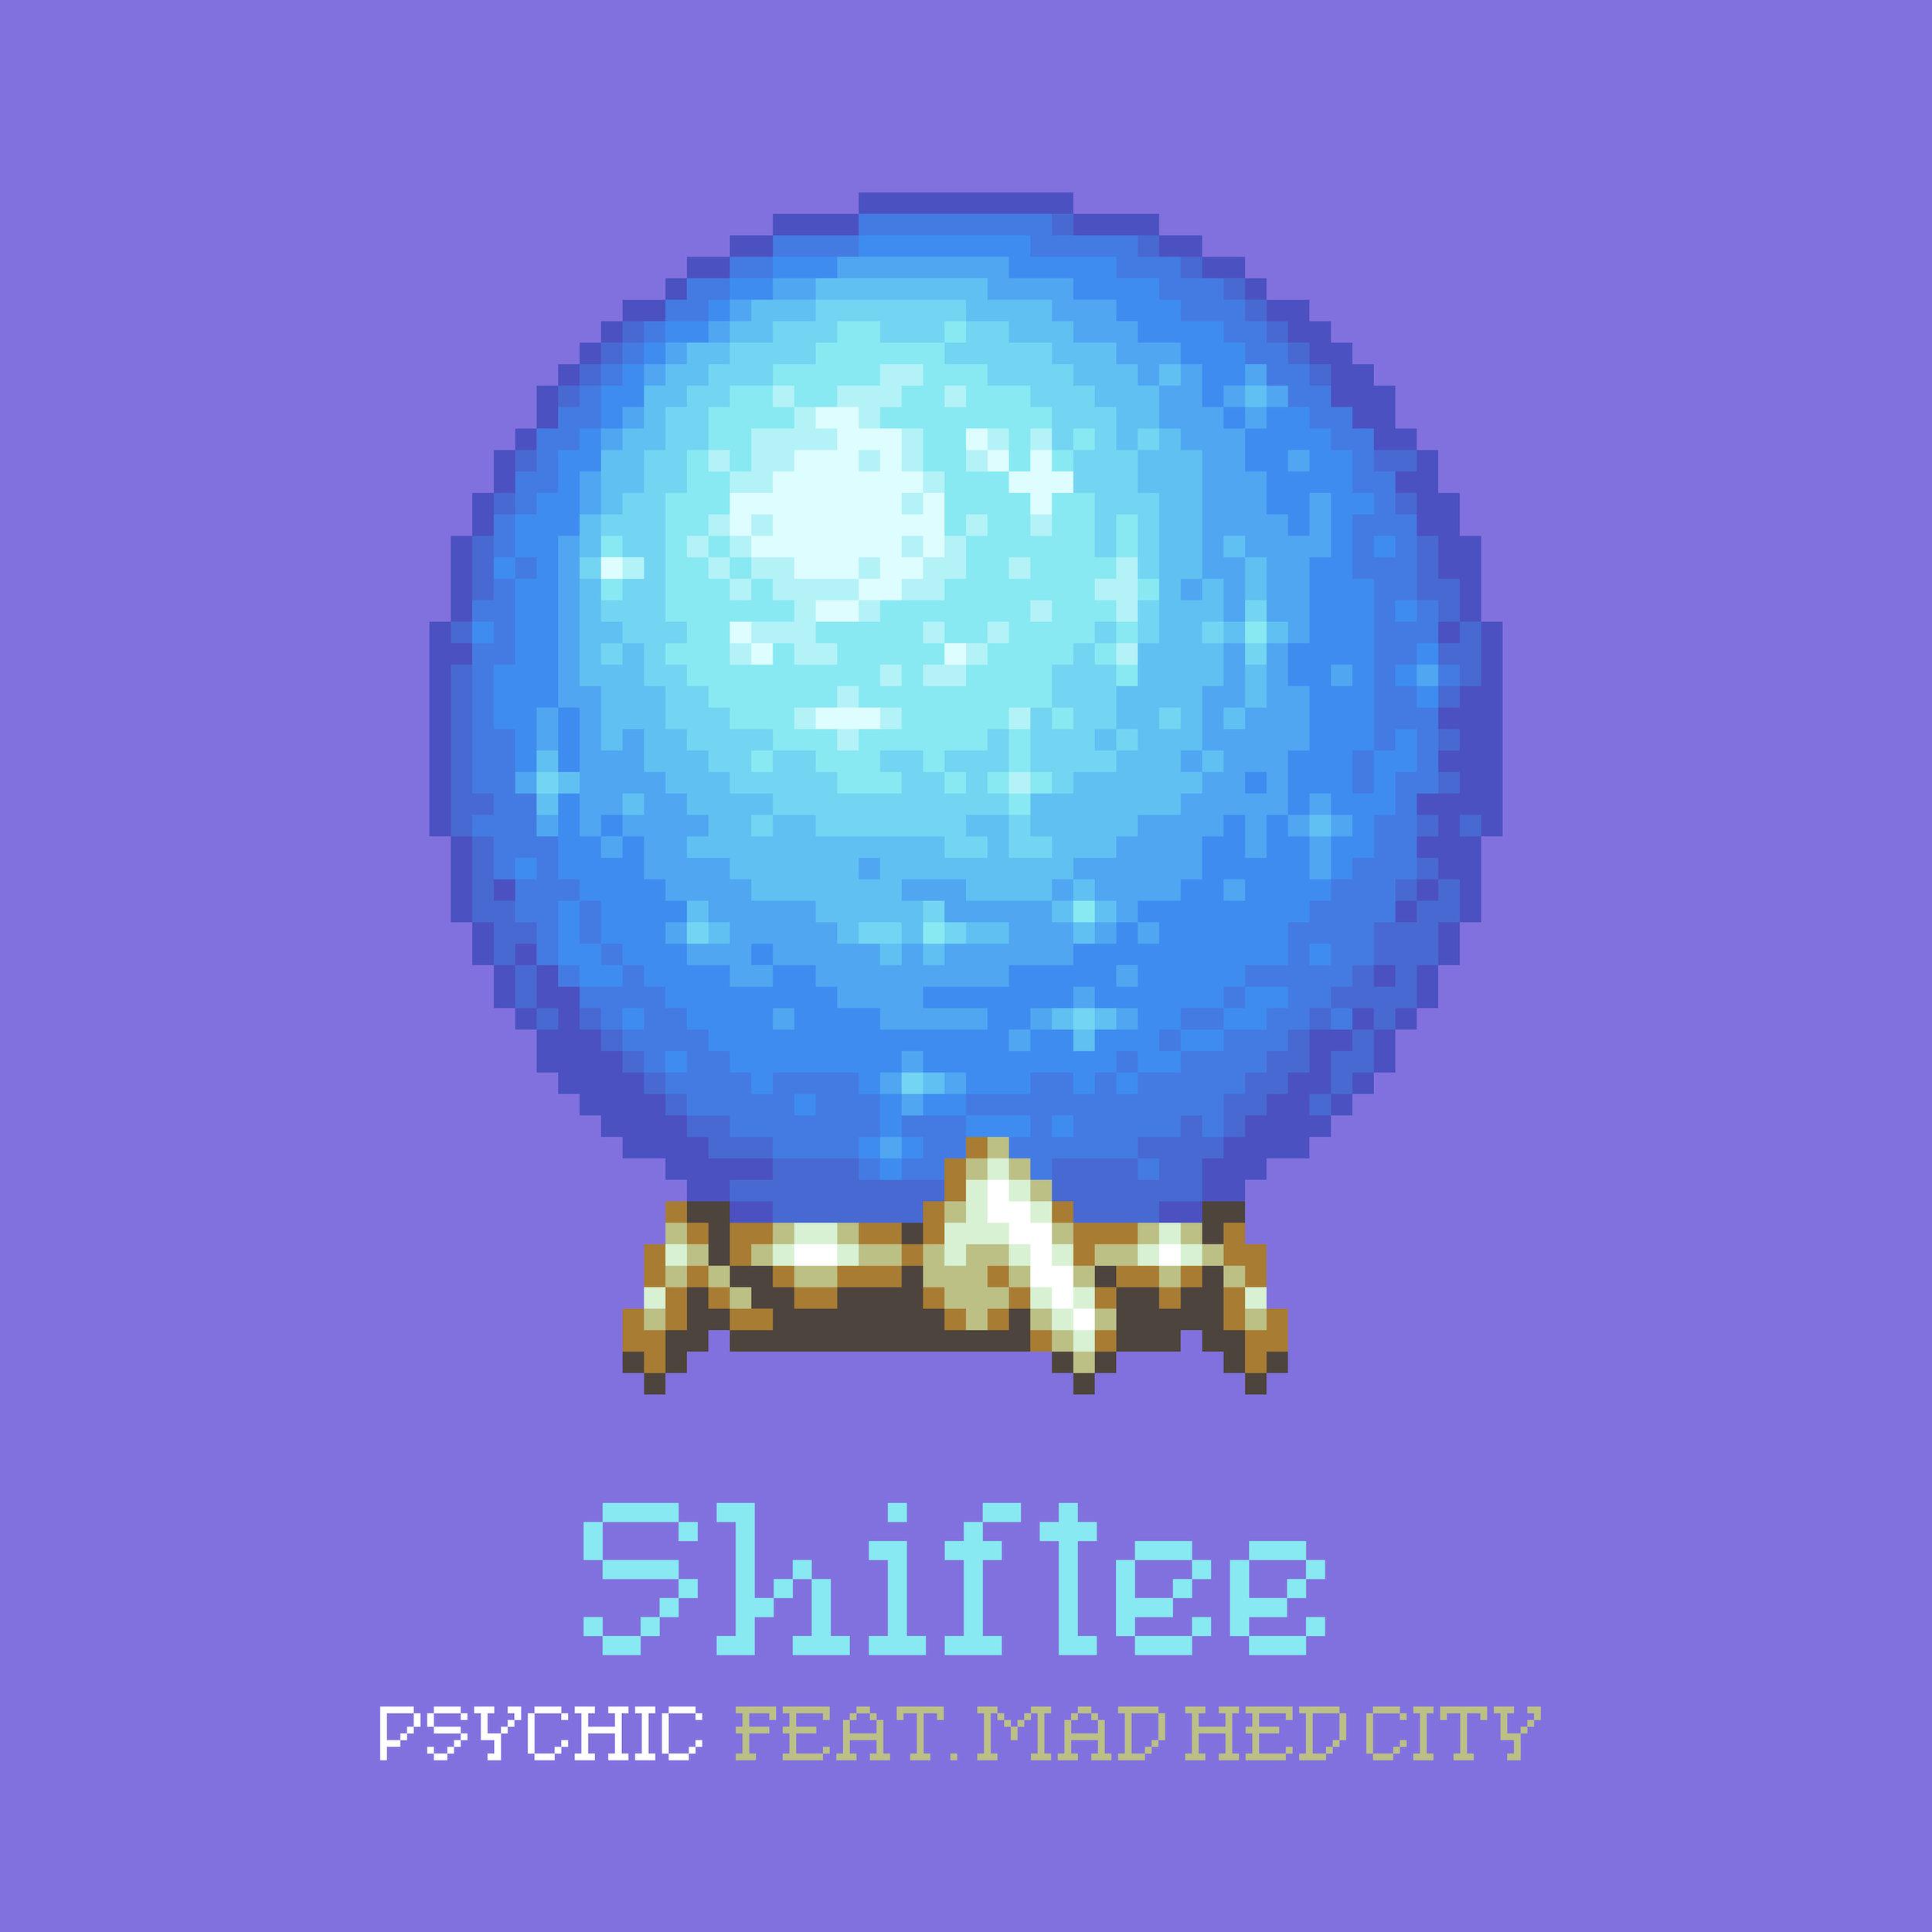 Shiftee - Psychic ART UPDATE copy.jpg